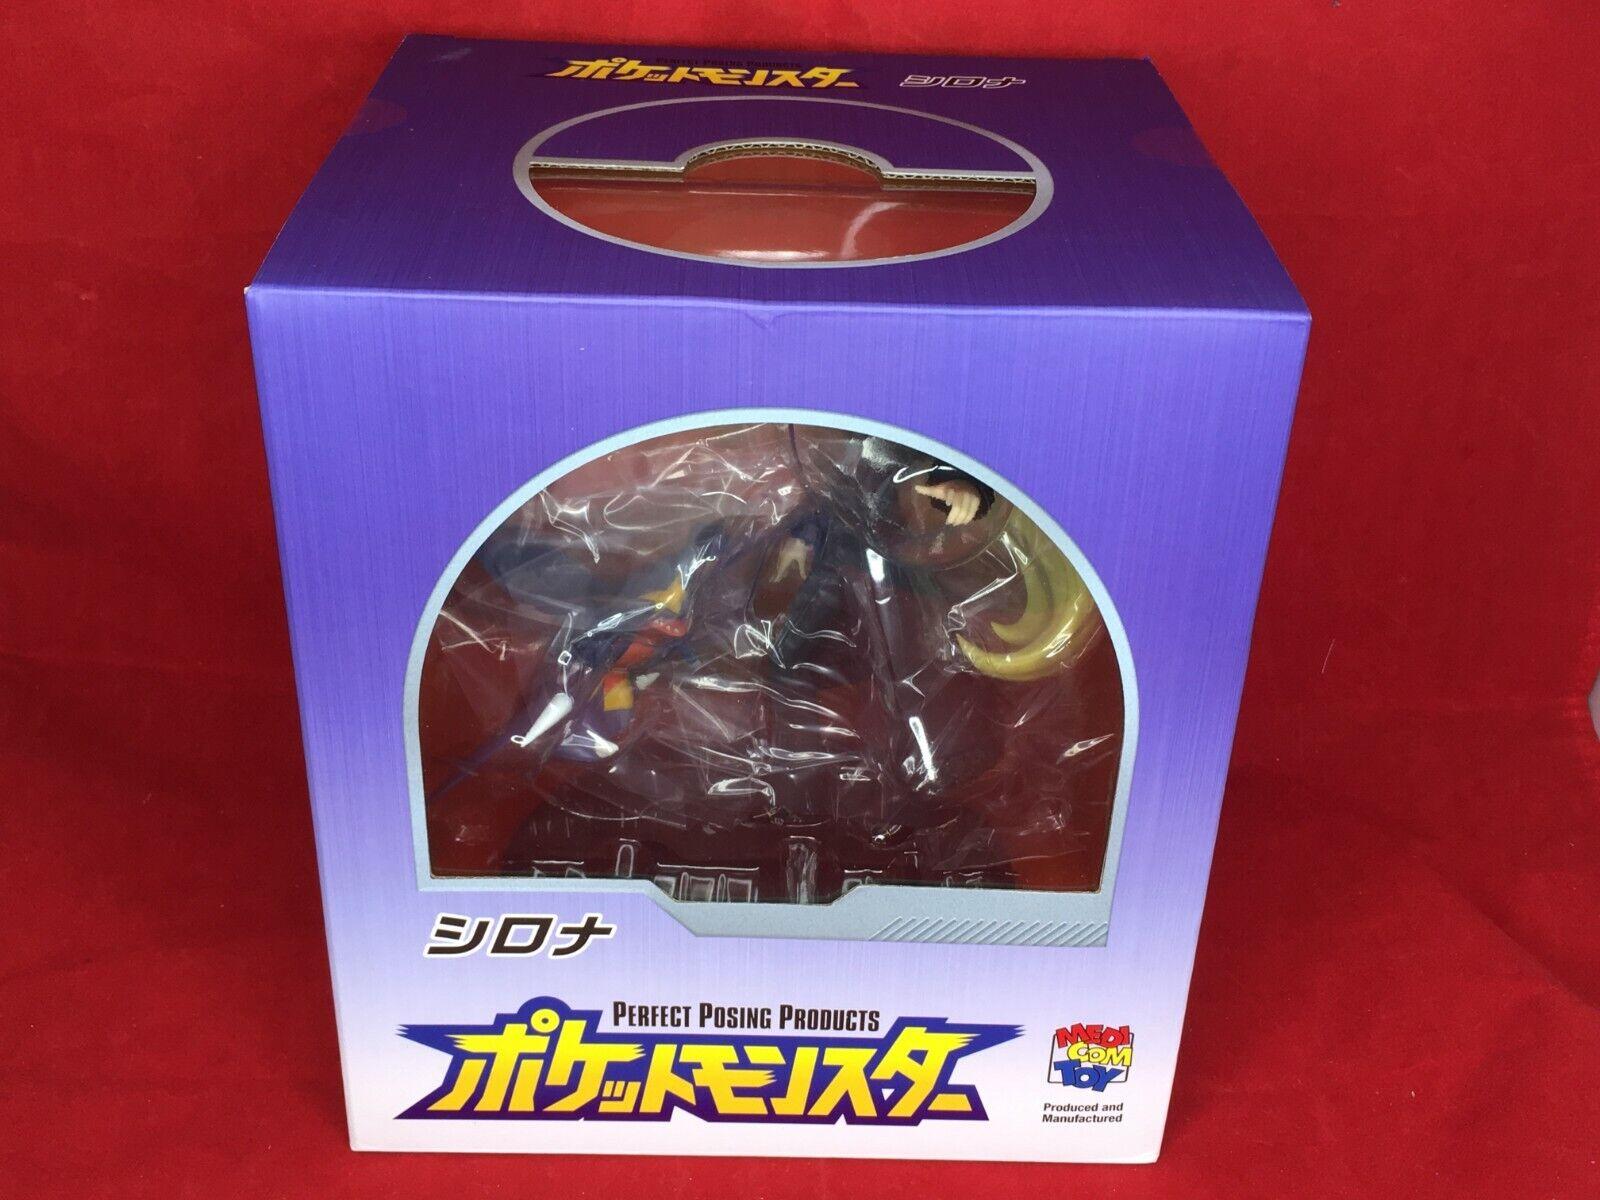 Mapa del juguete medicom del Japón PPP pokemon Cynthia (shirona)